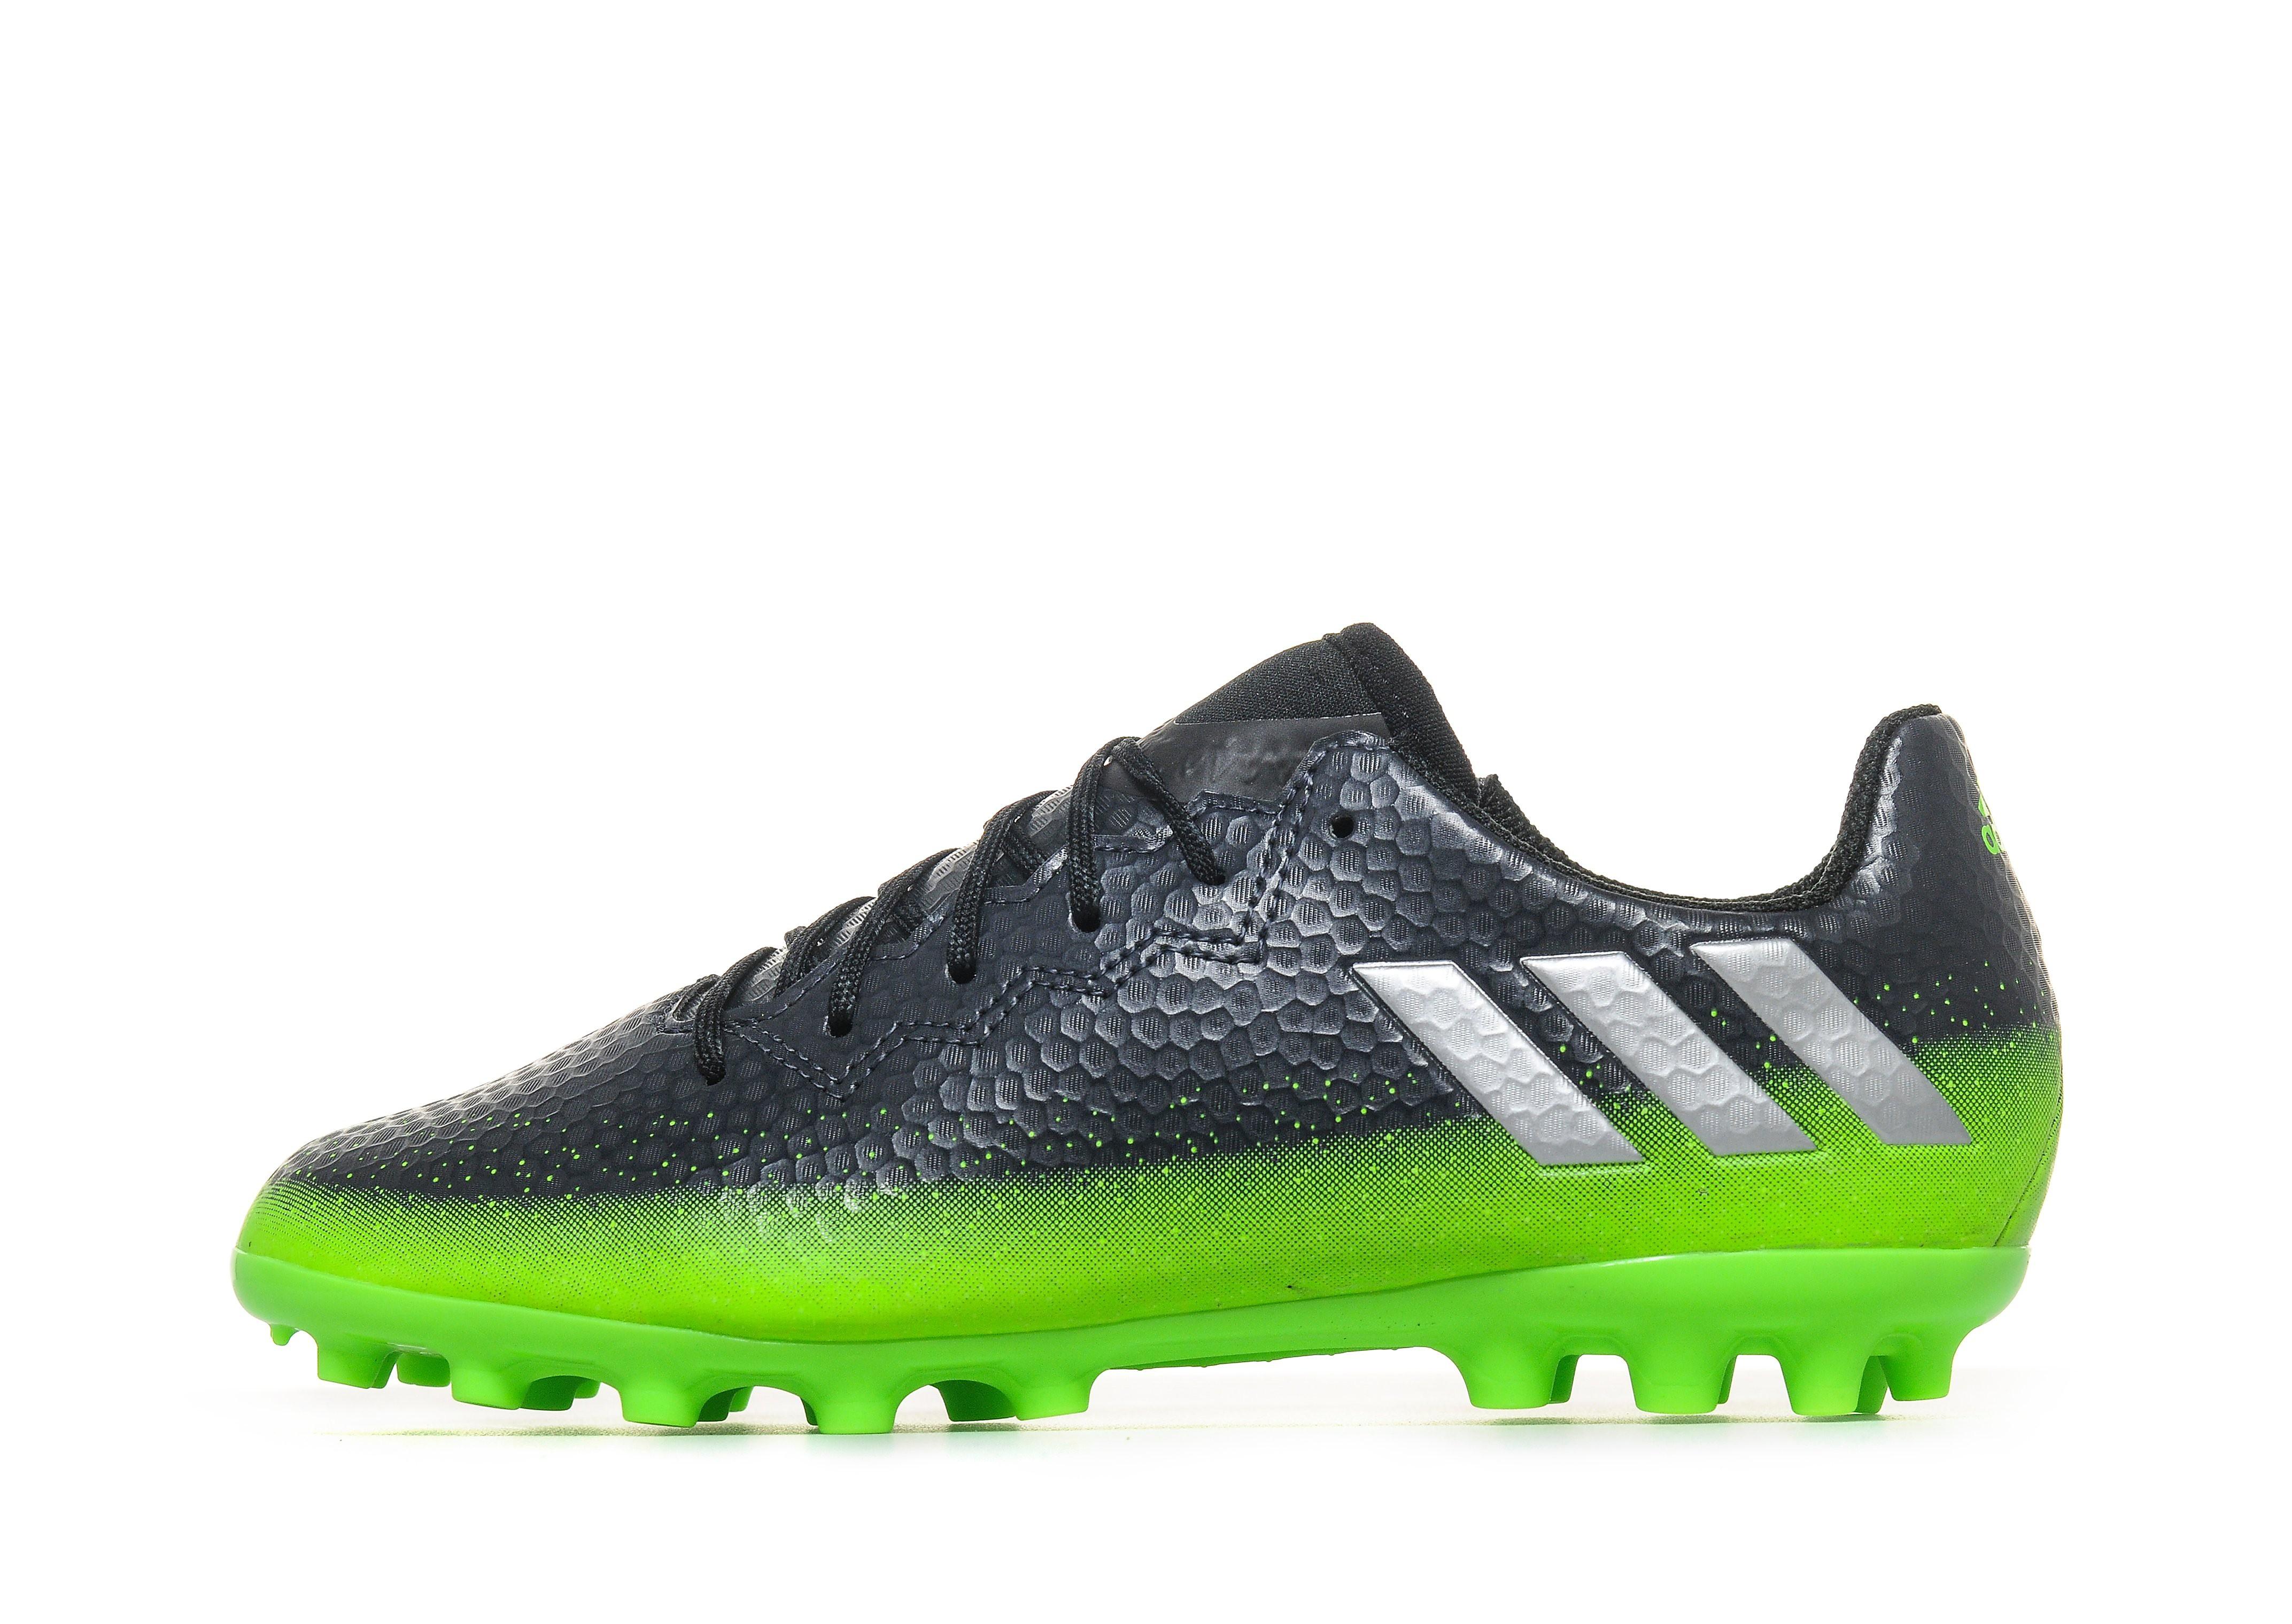 adidas Space Dust Messi 16.3 AG Children